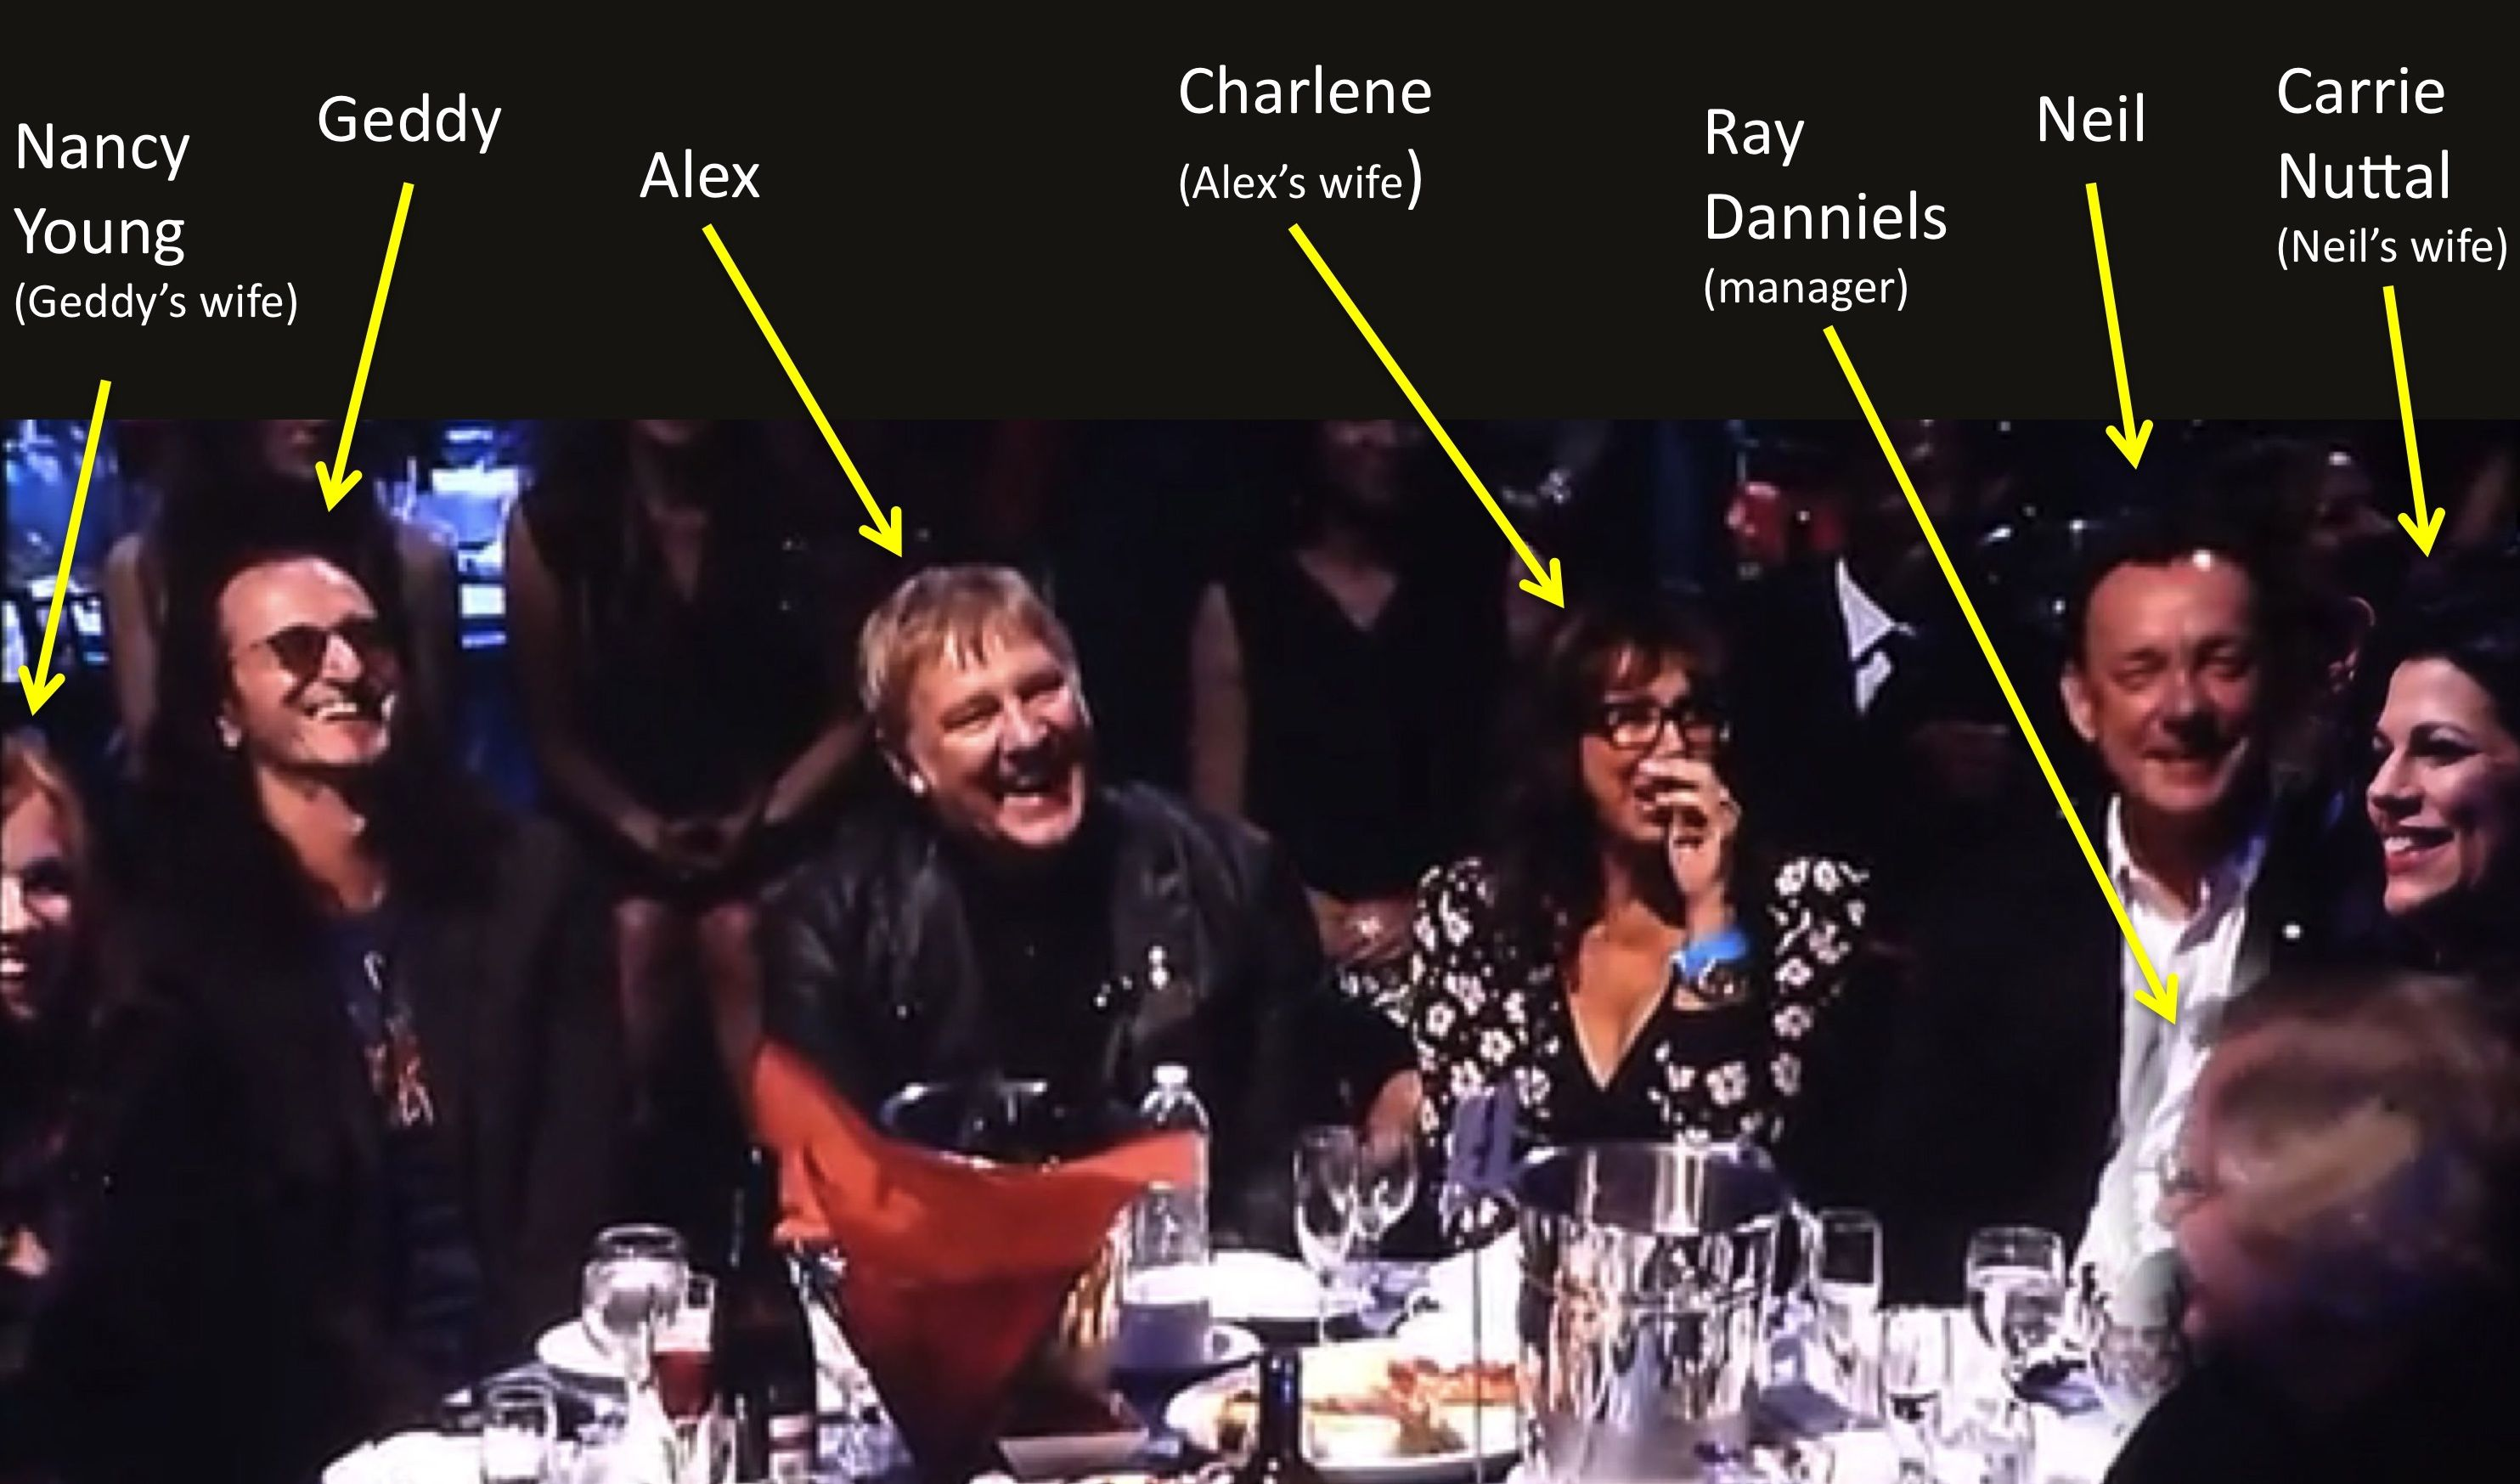 Lifeson, Charlene Biography